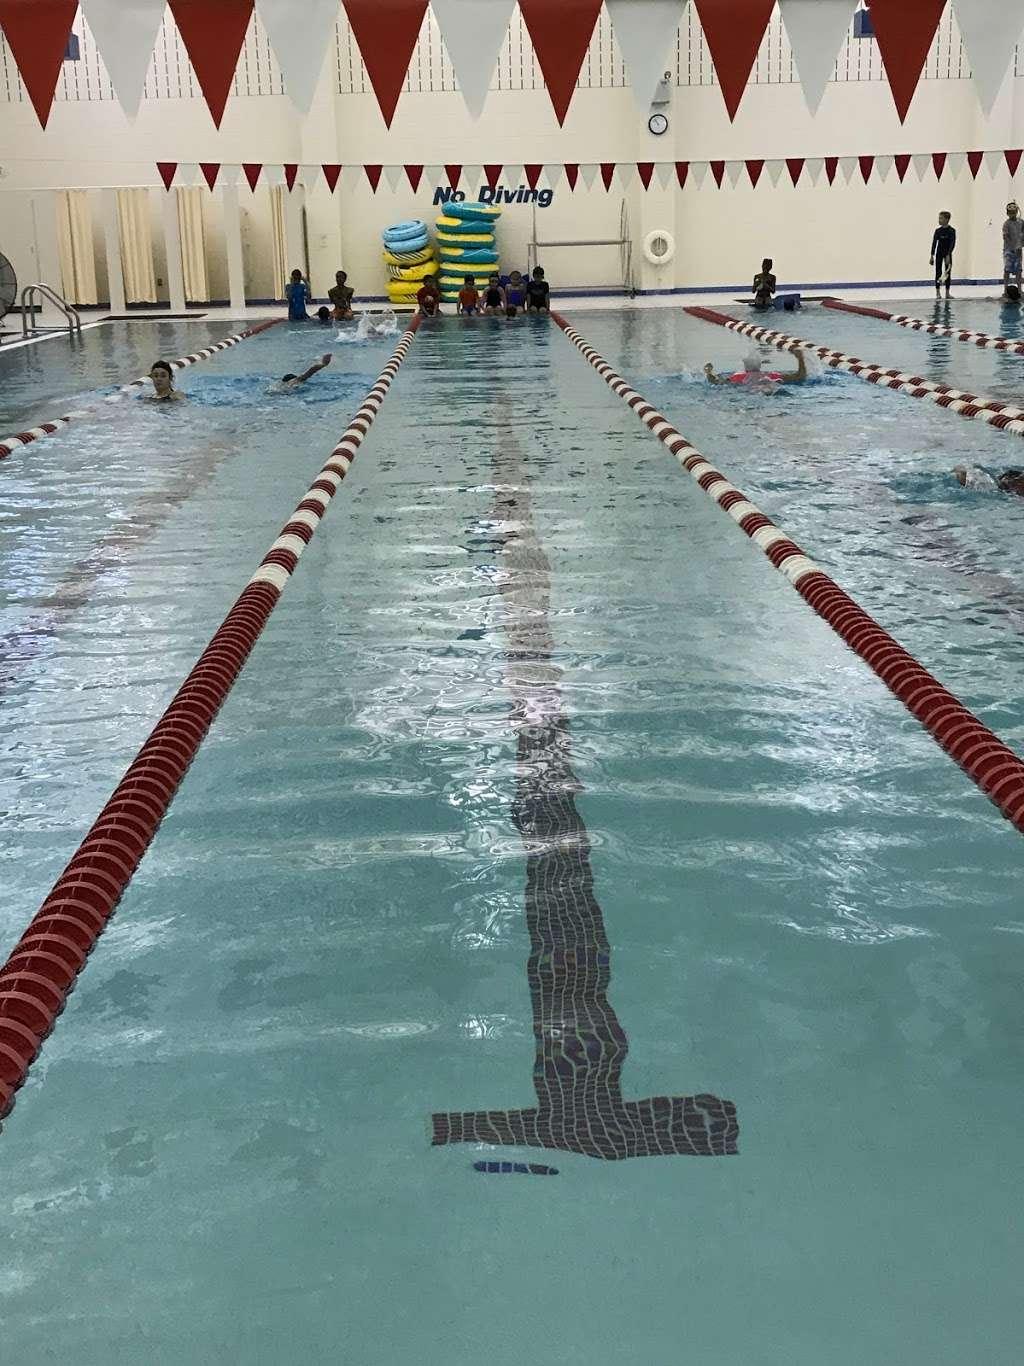 Cook/Douglass Recreation Center - gym  | Photo 7 of 10 | Address: 50 Biel Rd, New Brunswick, NJ 08901, USA | Phone: (848) 932-8700